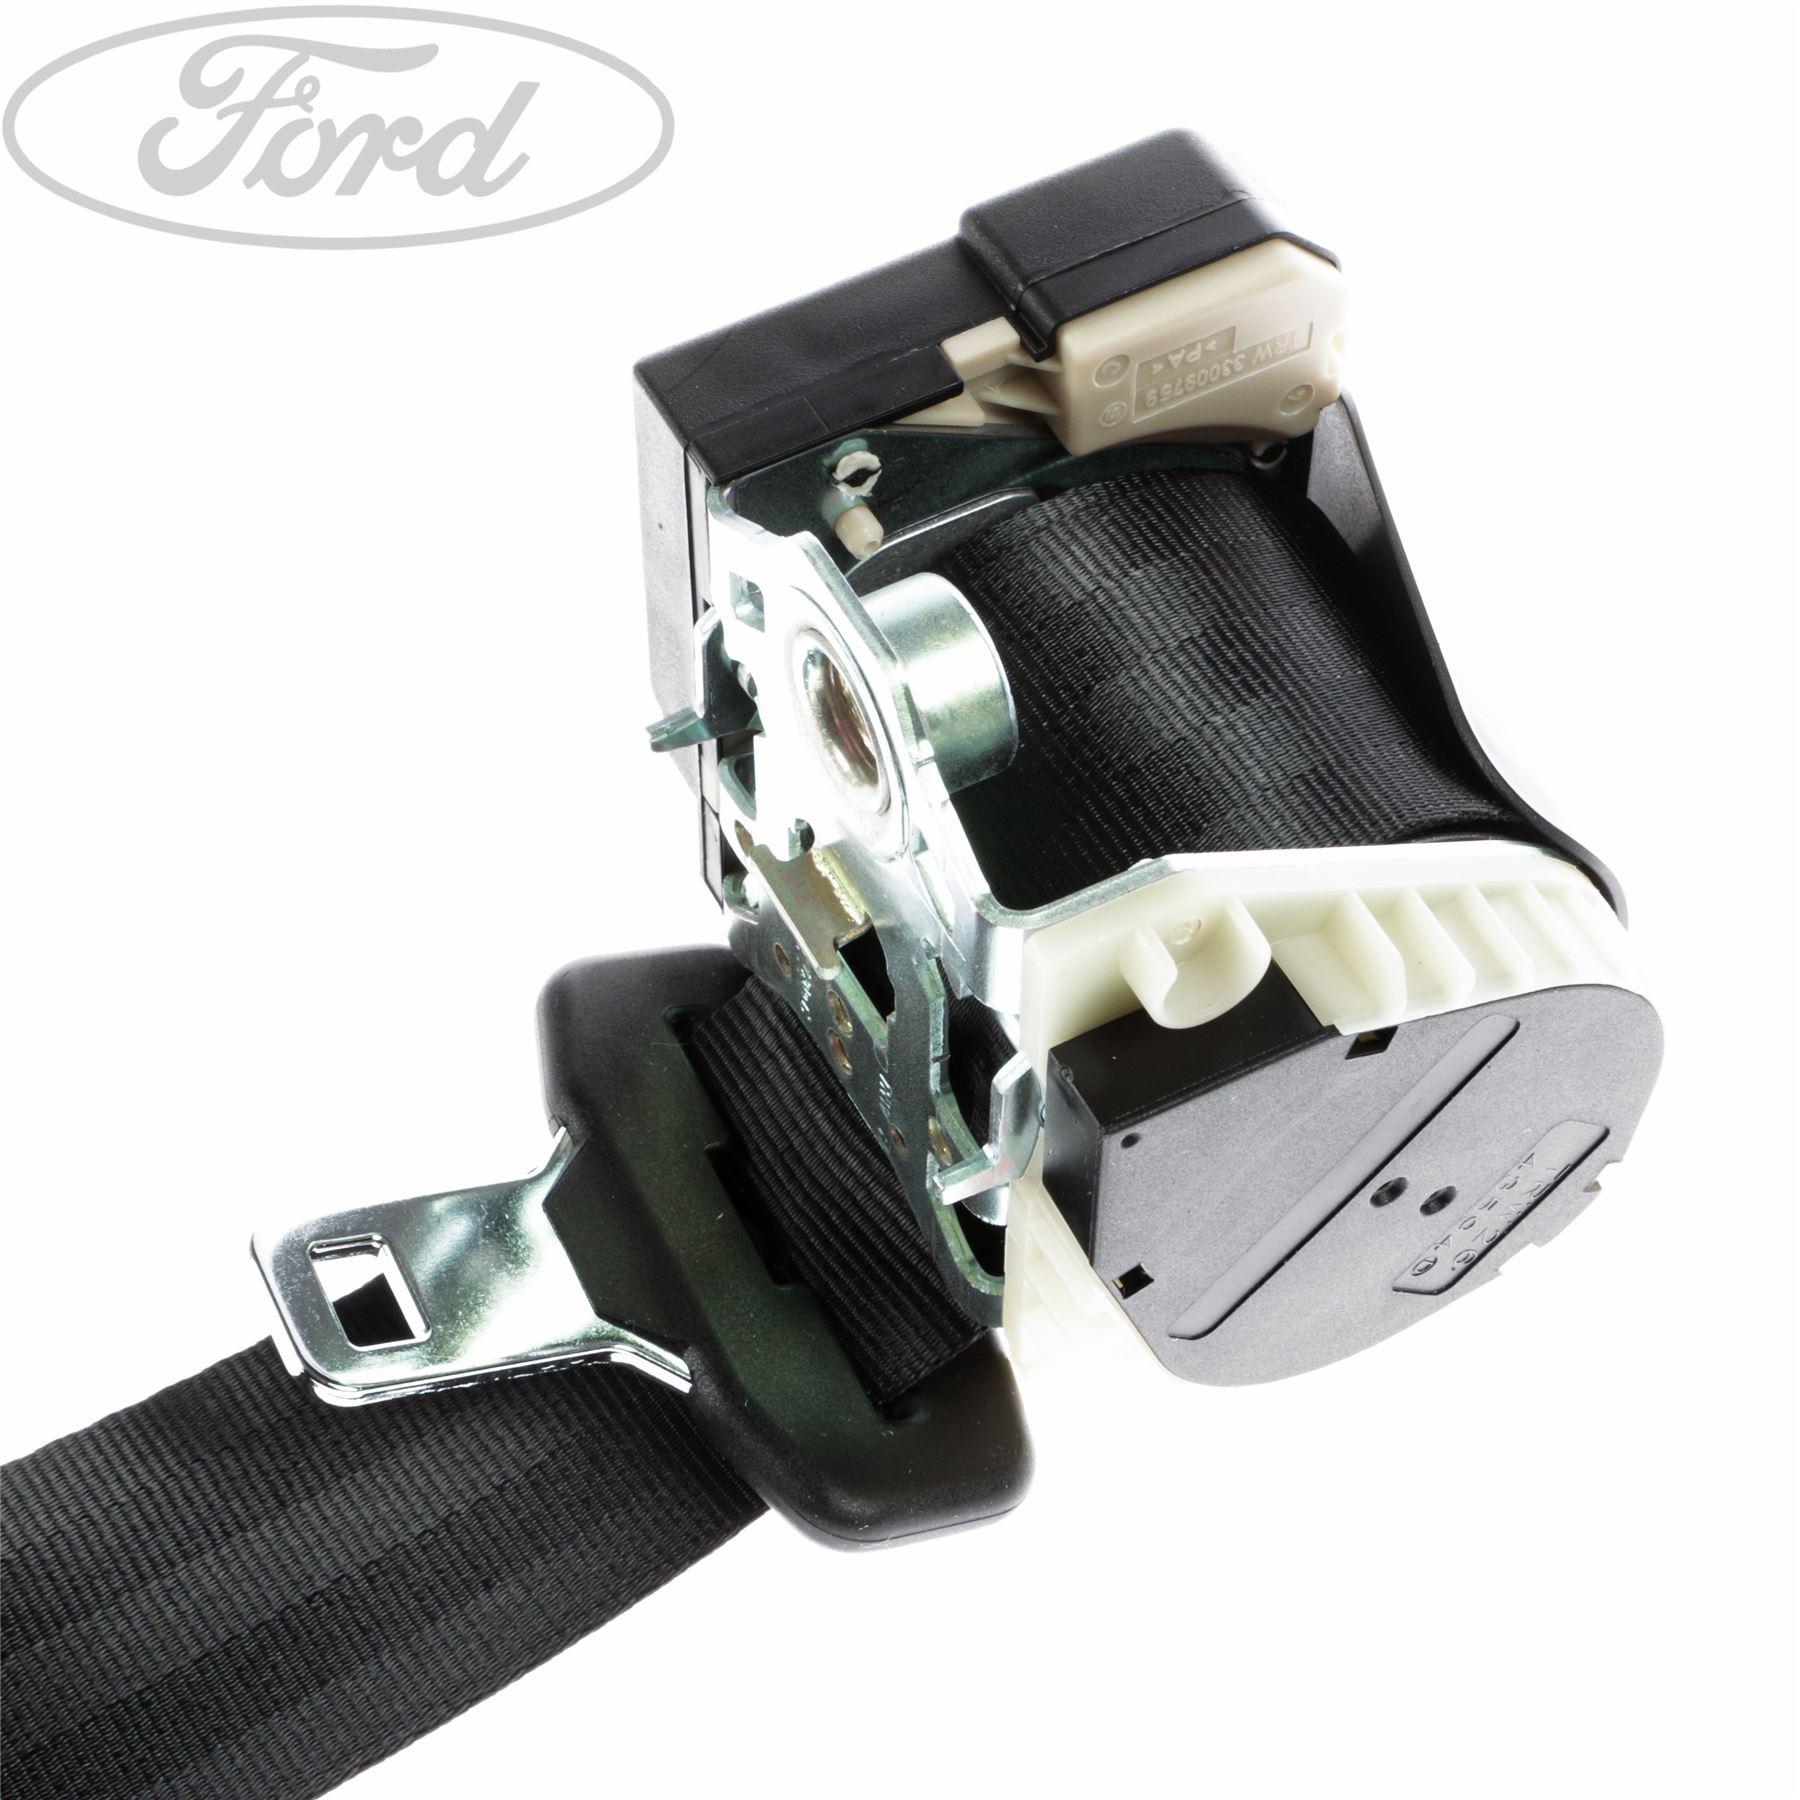 Genuine Ford Focus MK2 Kuga MK1 Rear Seat Belt 1778062